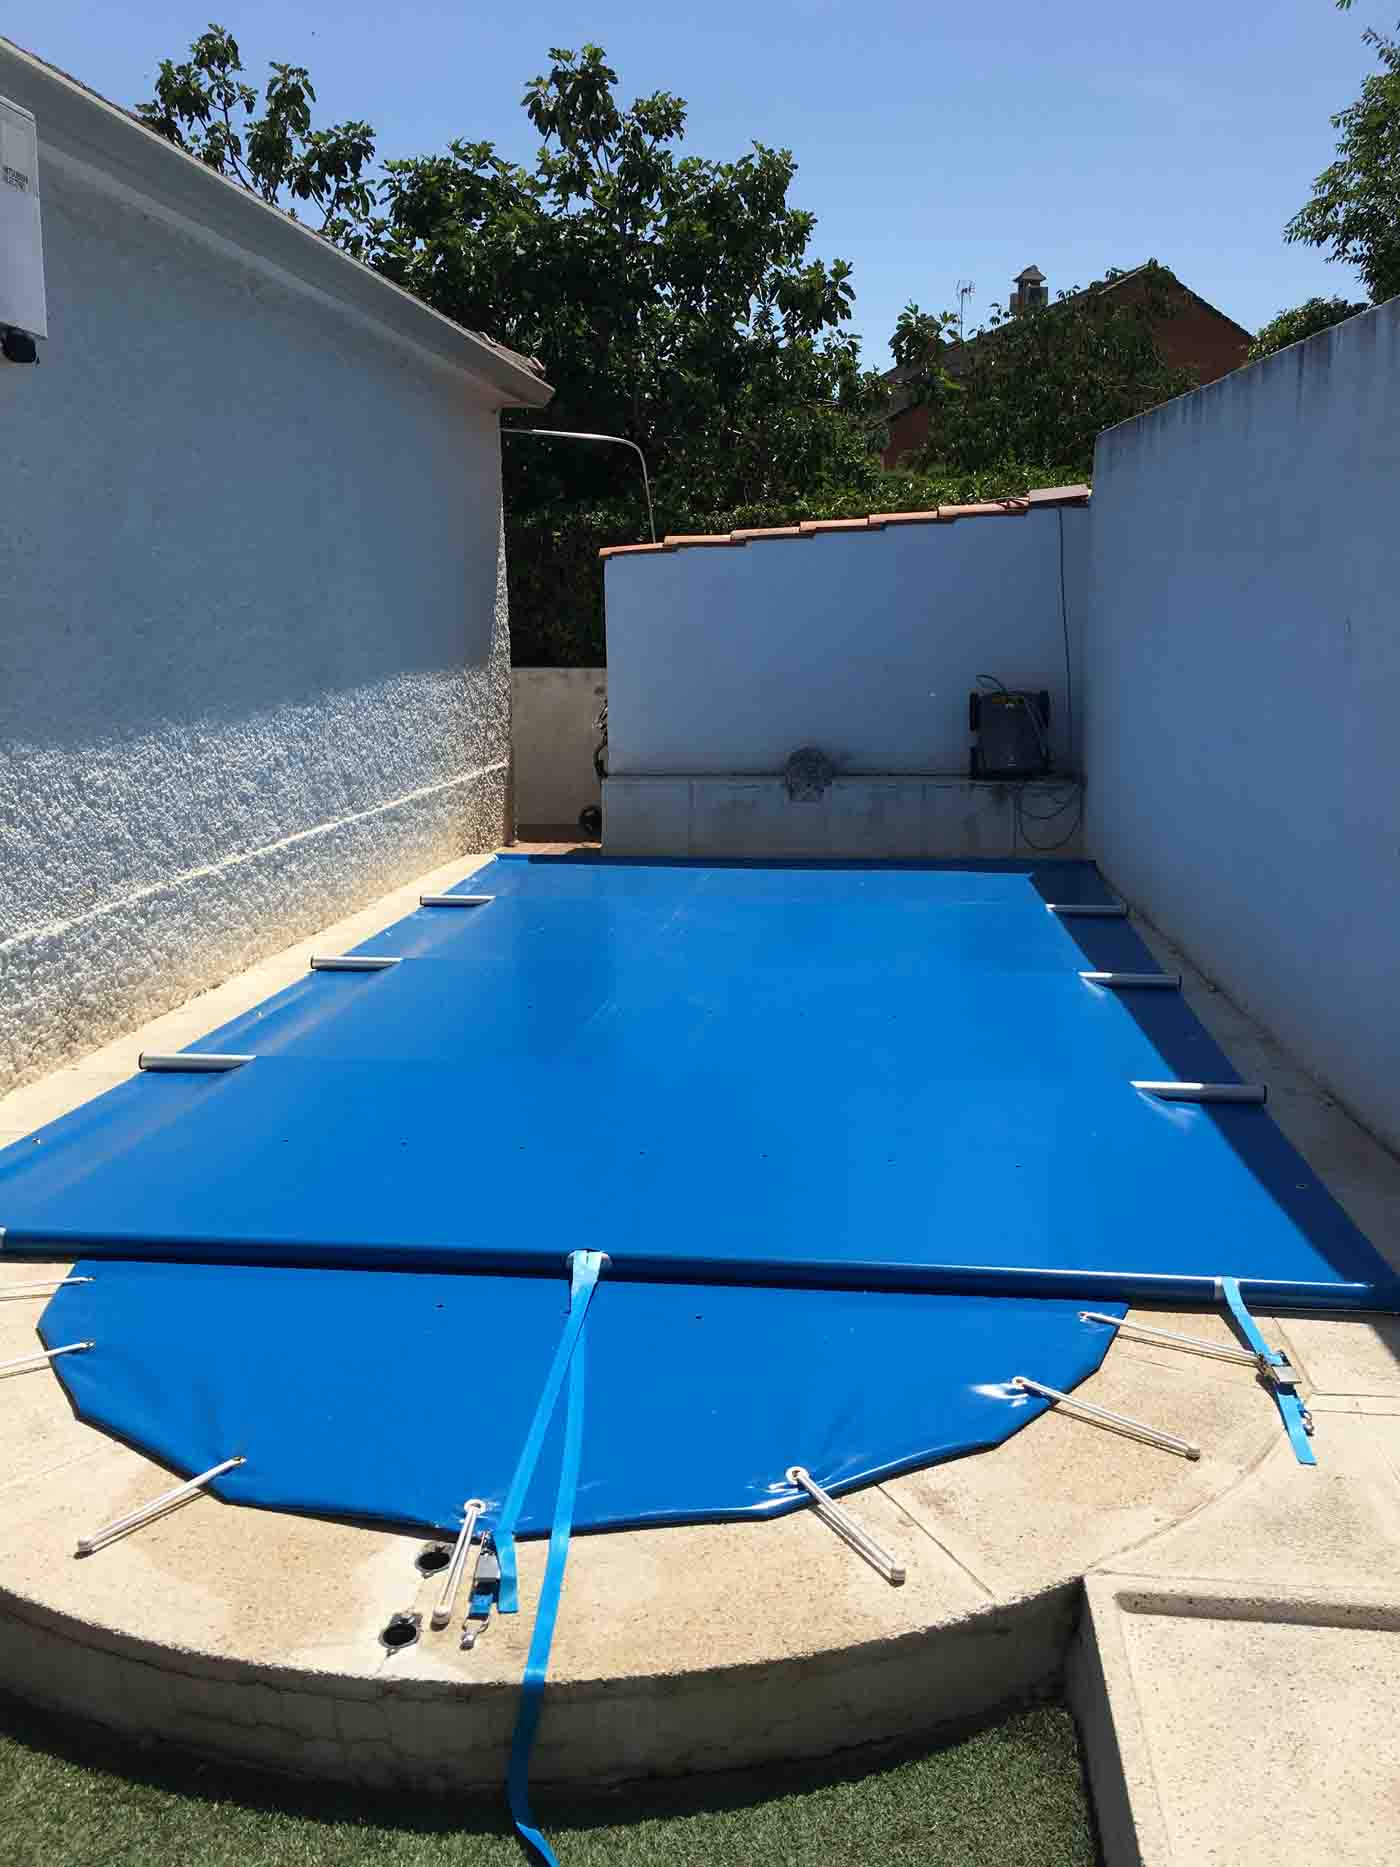 cobertores piscinas solares